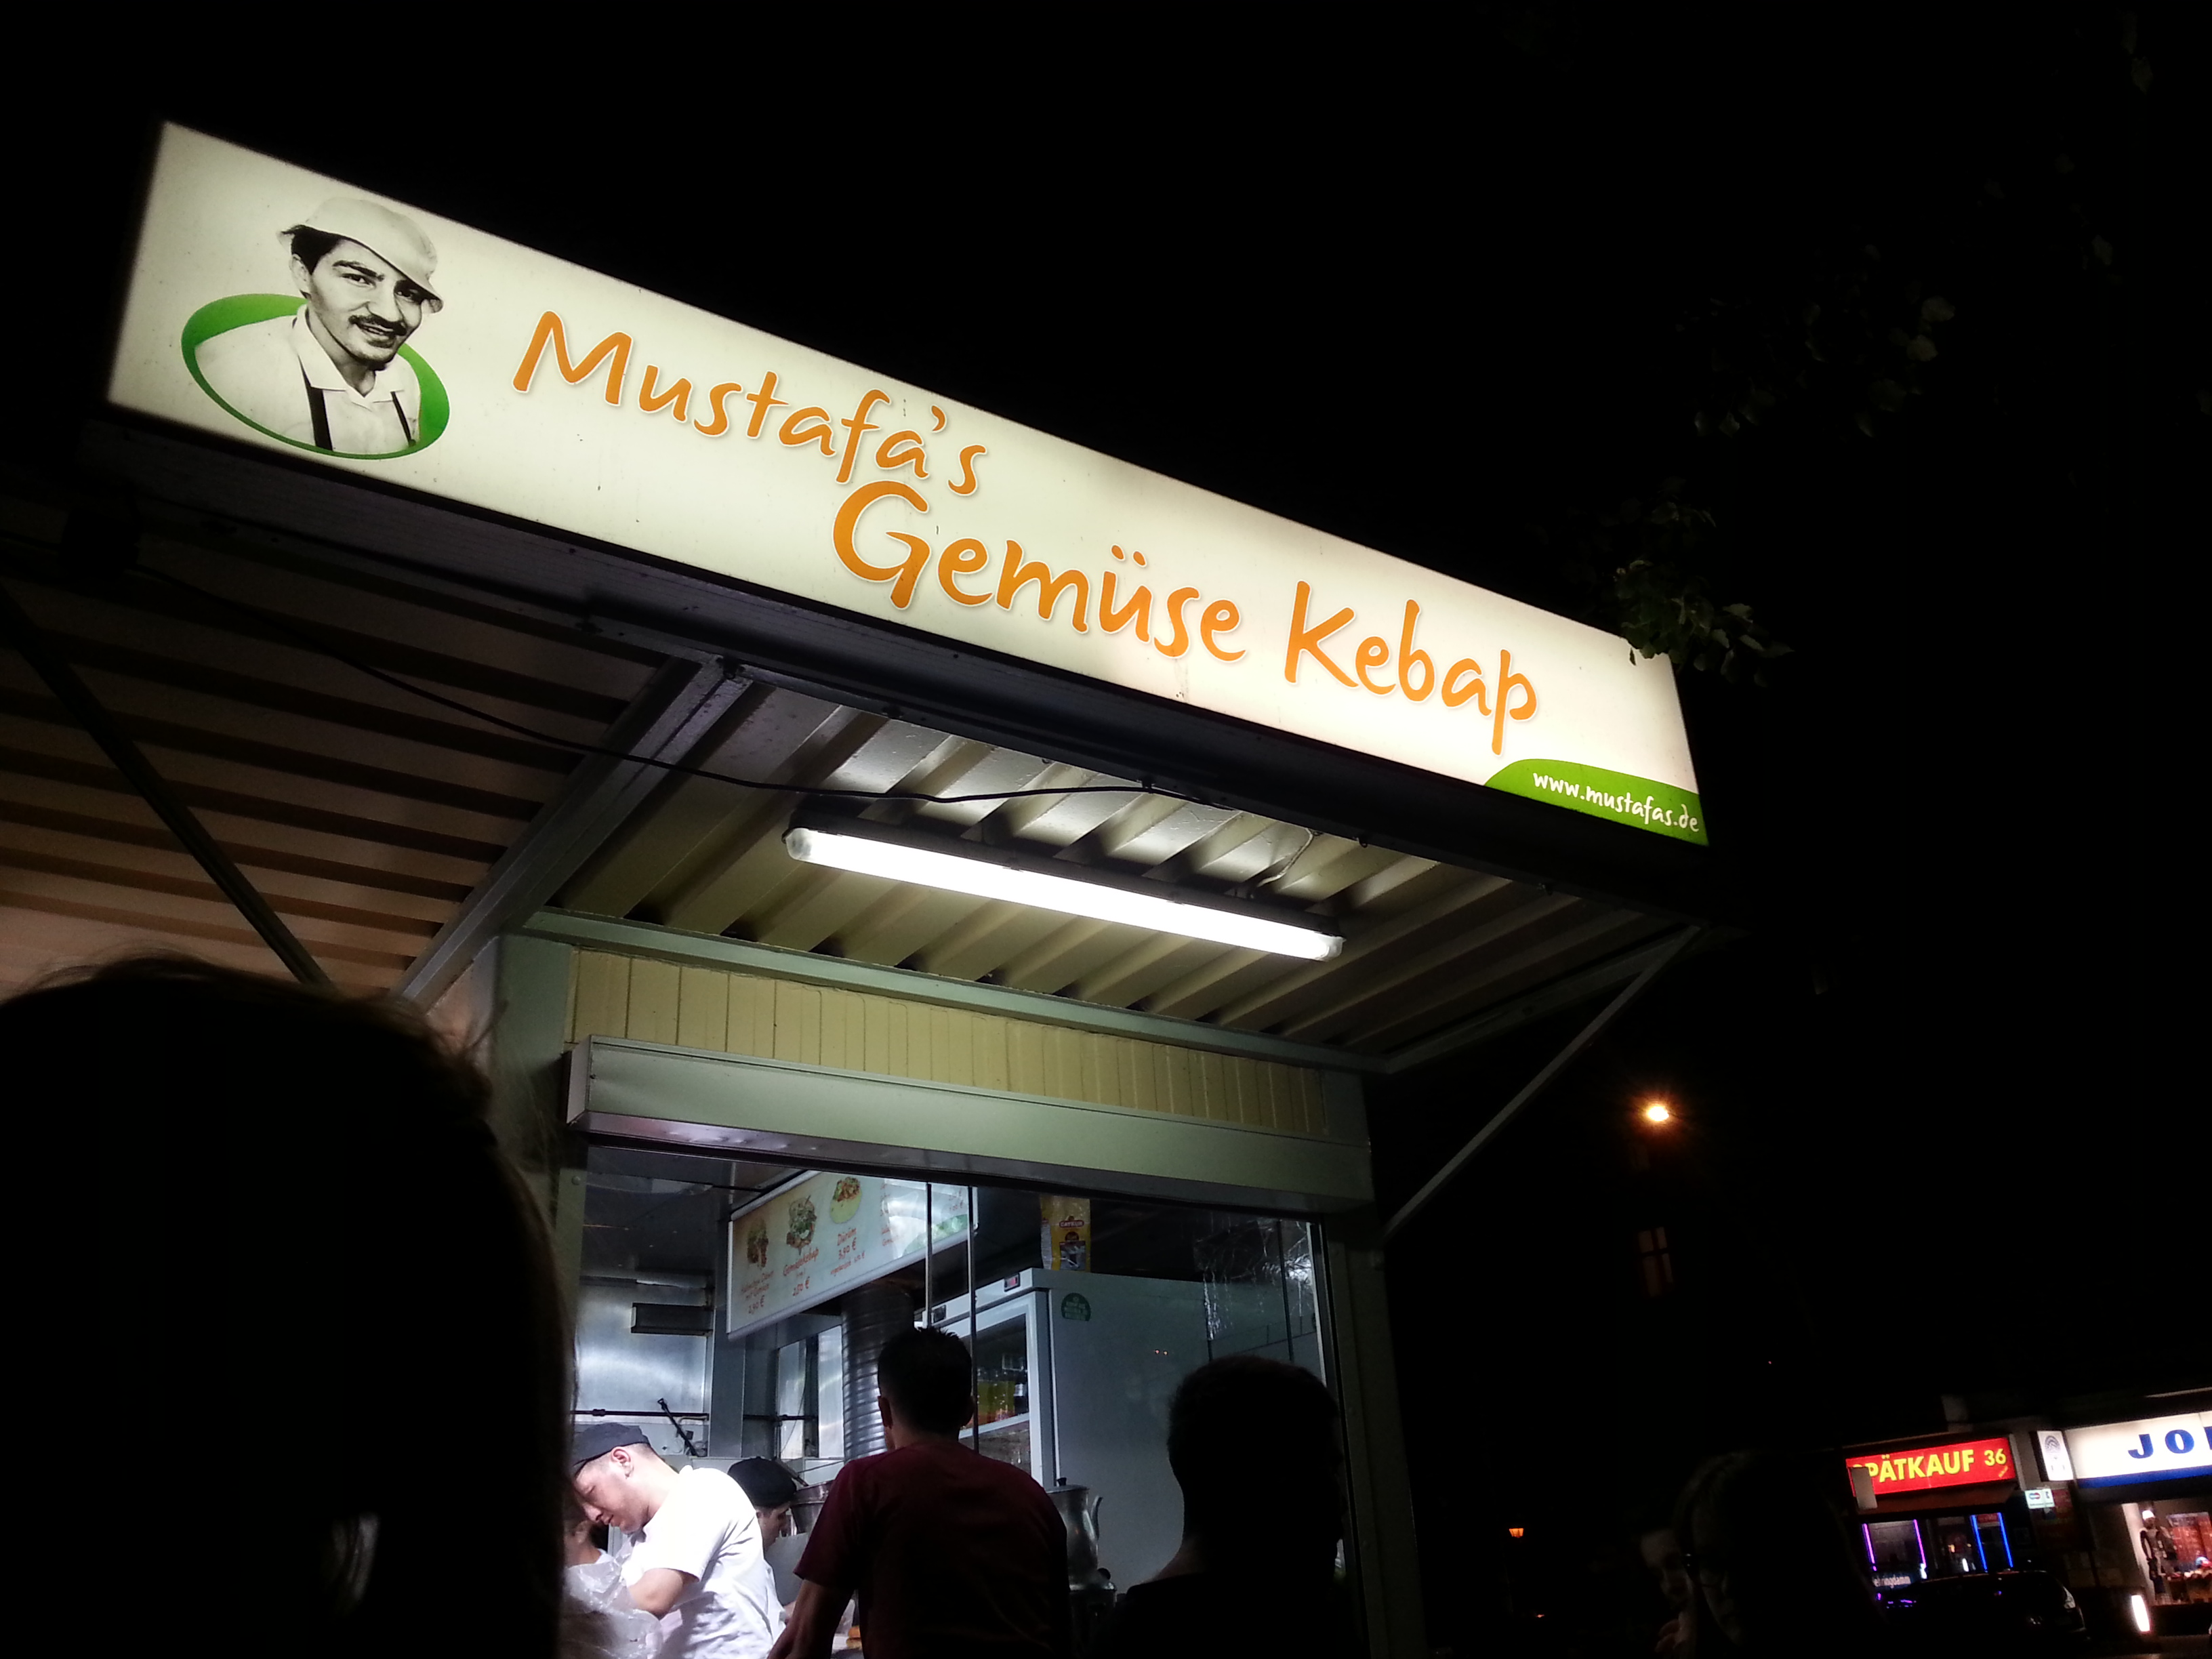 Ein Beispiel ist die Website meines Lieblings-Döner-Imbiss' Mustafas Gemüsekebap.